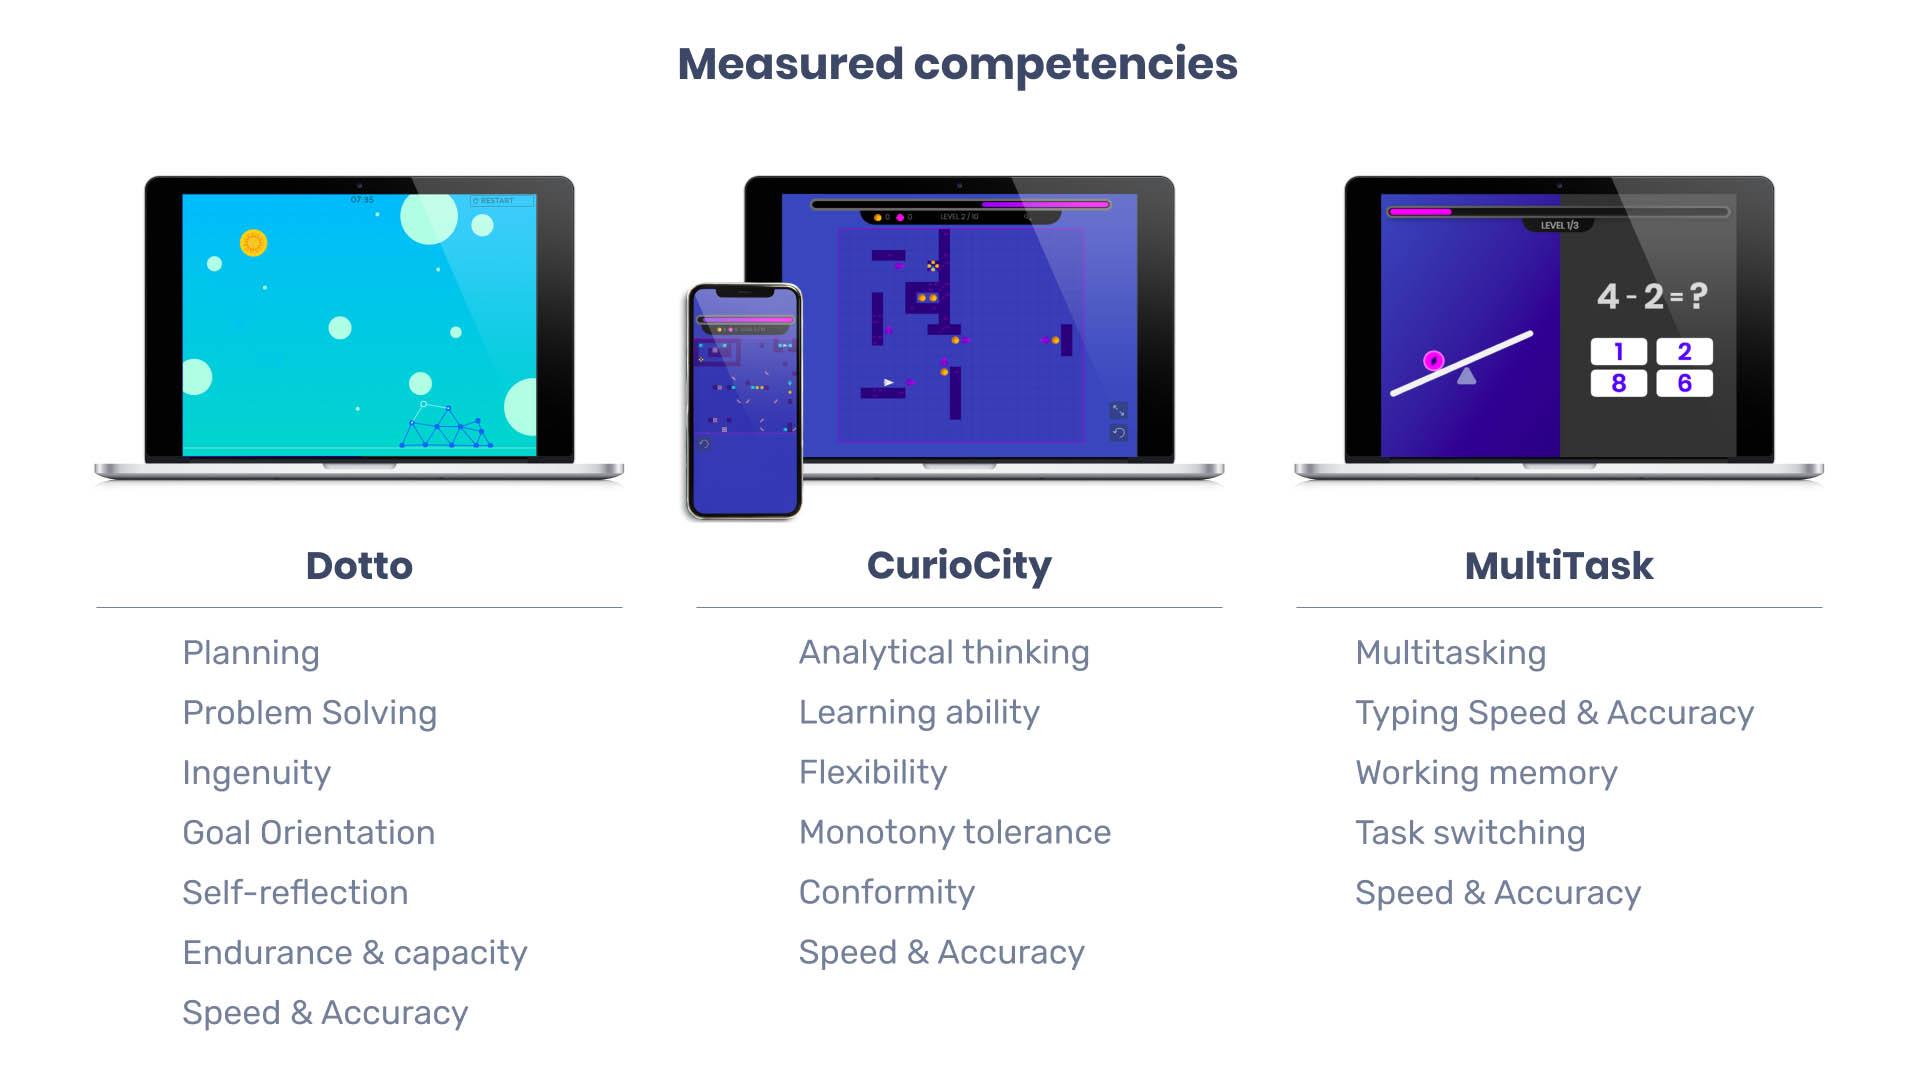 Measured competencies